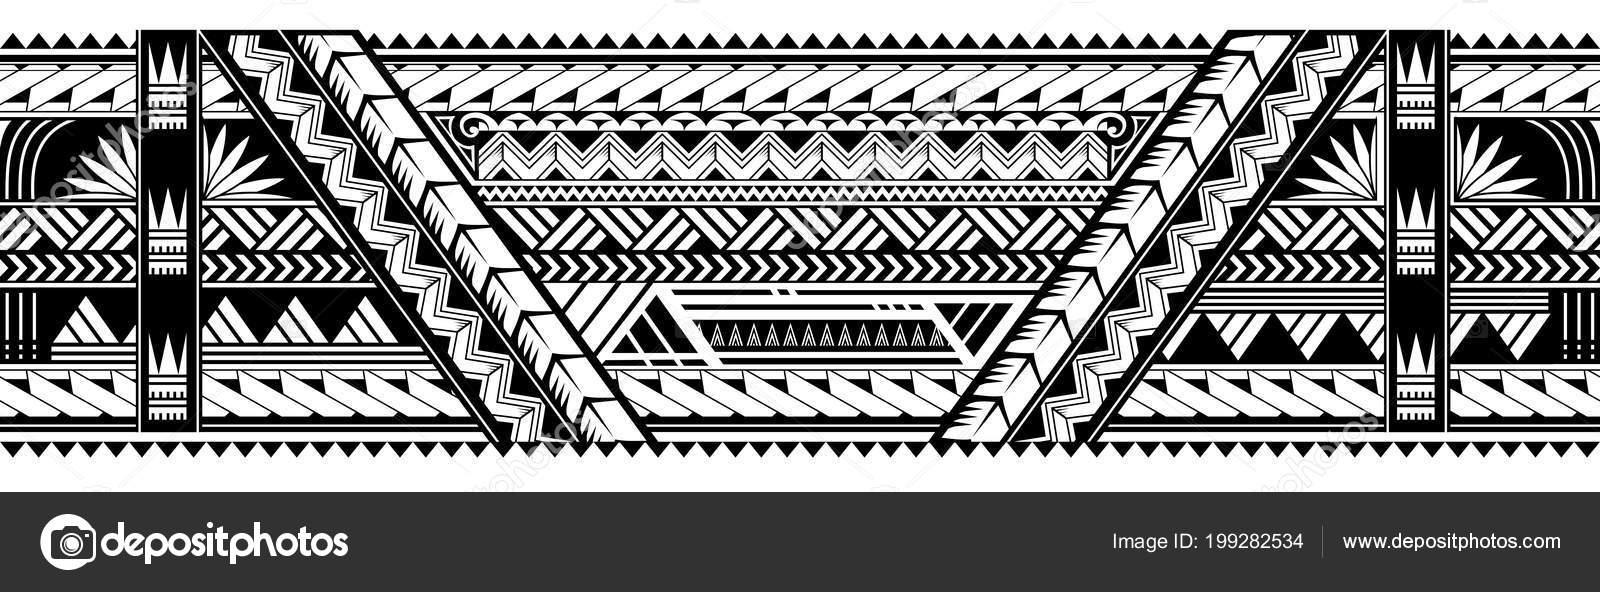 Maori Style Armband Tattoo Shape Stock Vector C Akv Lv 199282534